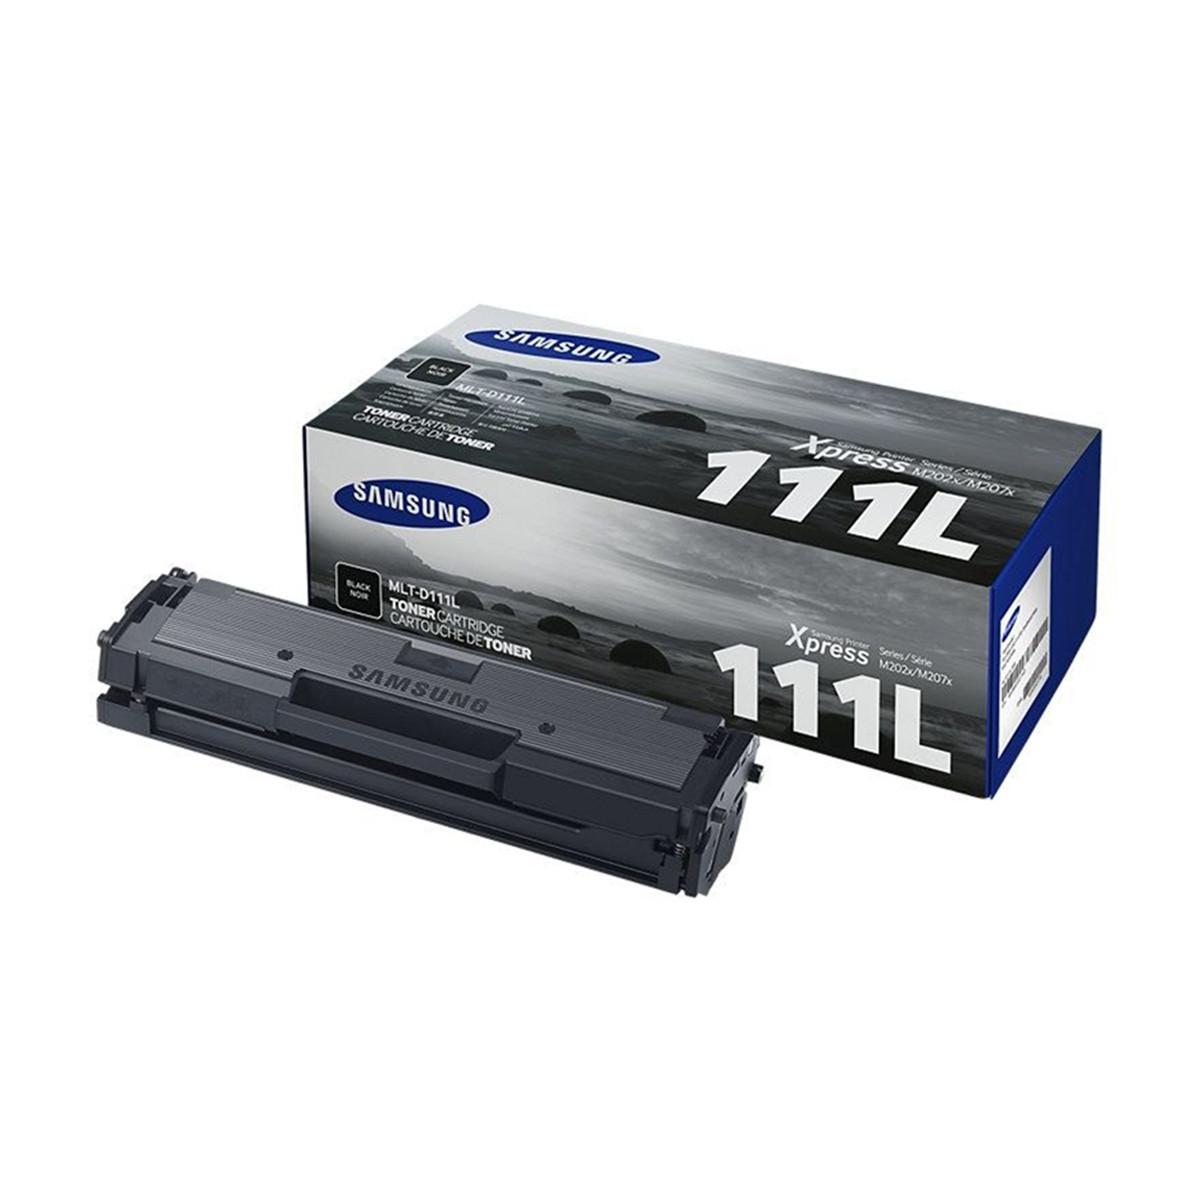 Toner Samsung MLT-D111L D111L | Xpress M2020 M2020FW M2070 M2070W M2070FW | Original 1.8k